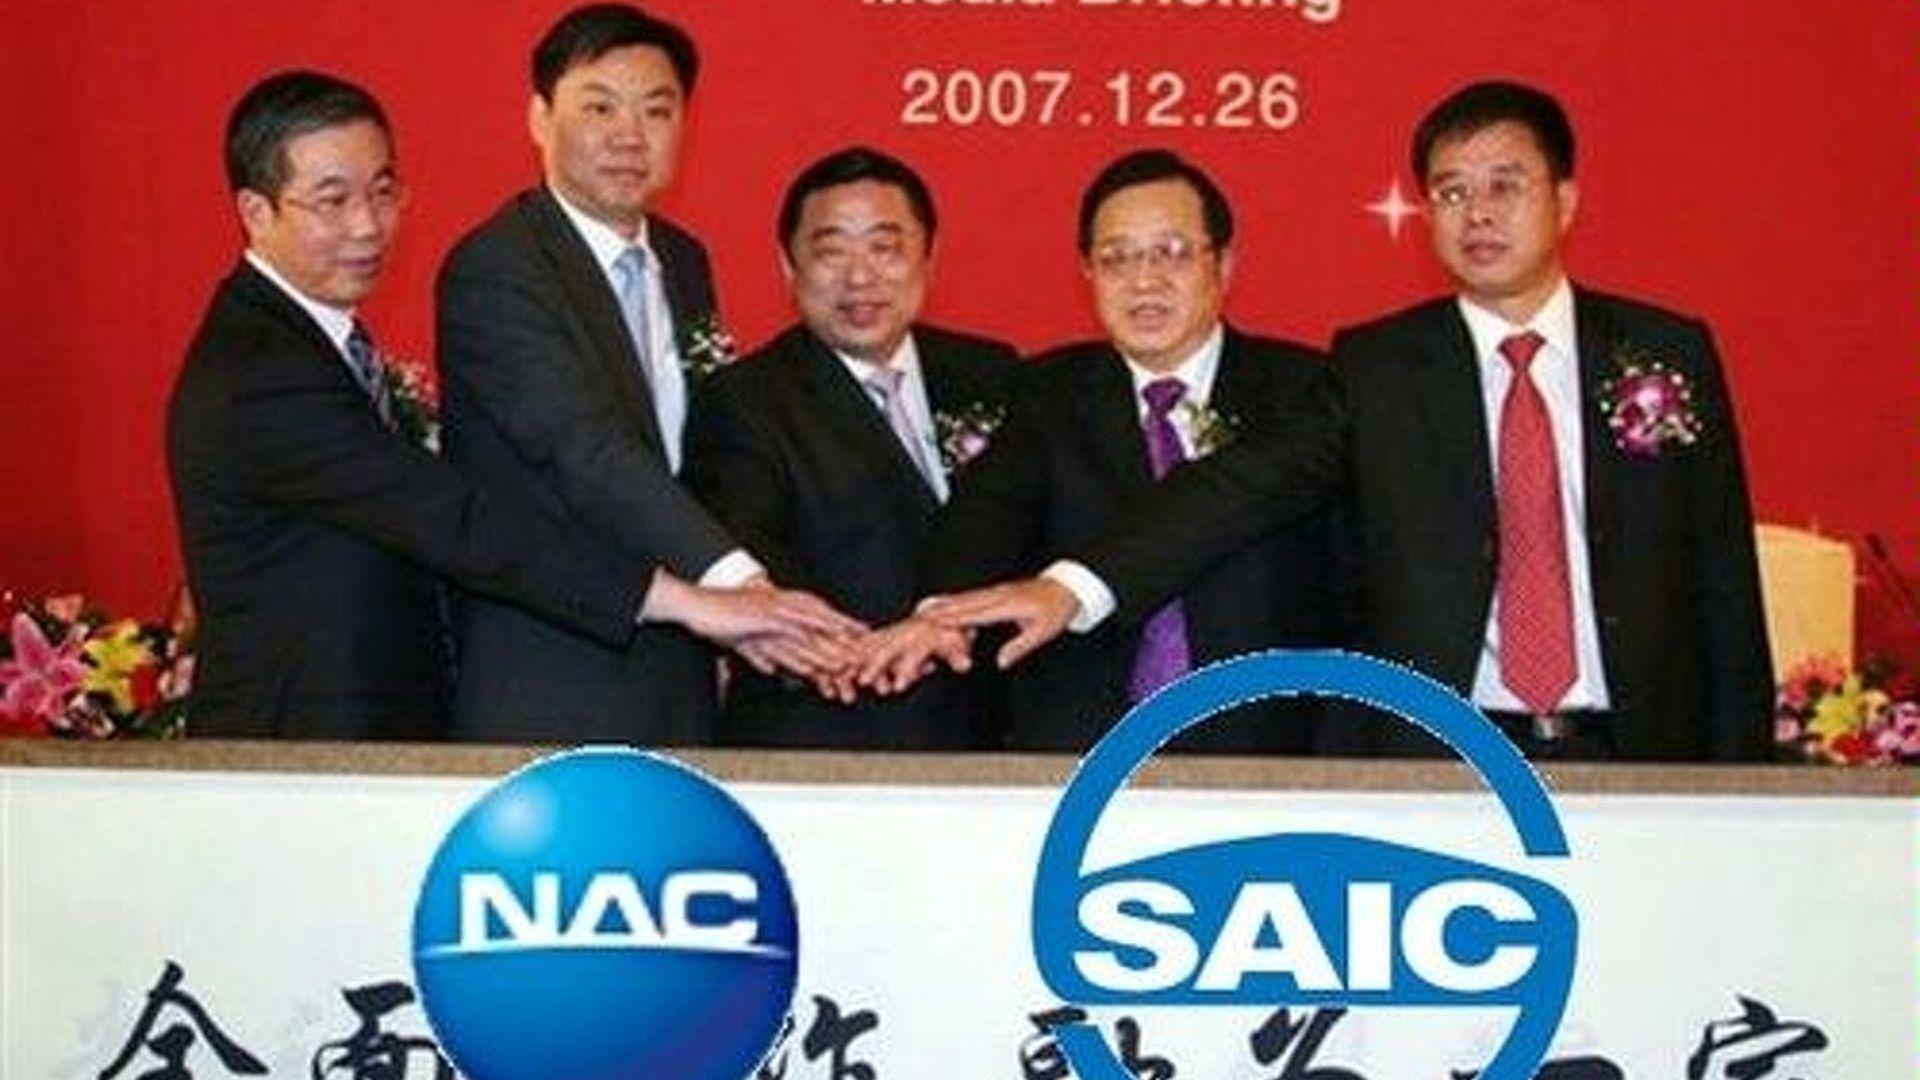 SAIC - NAC: Merge and Consolidate (CN)